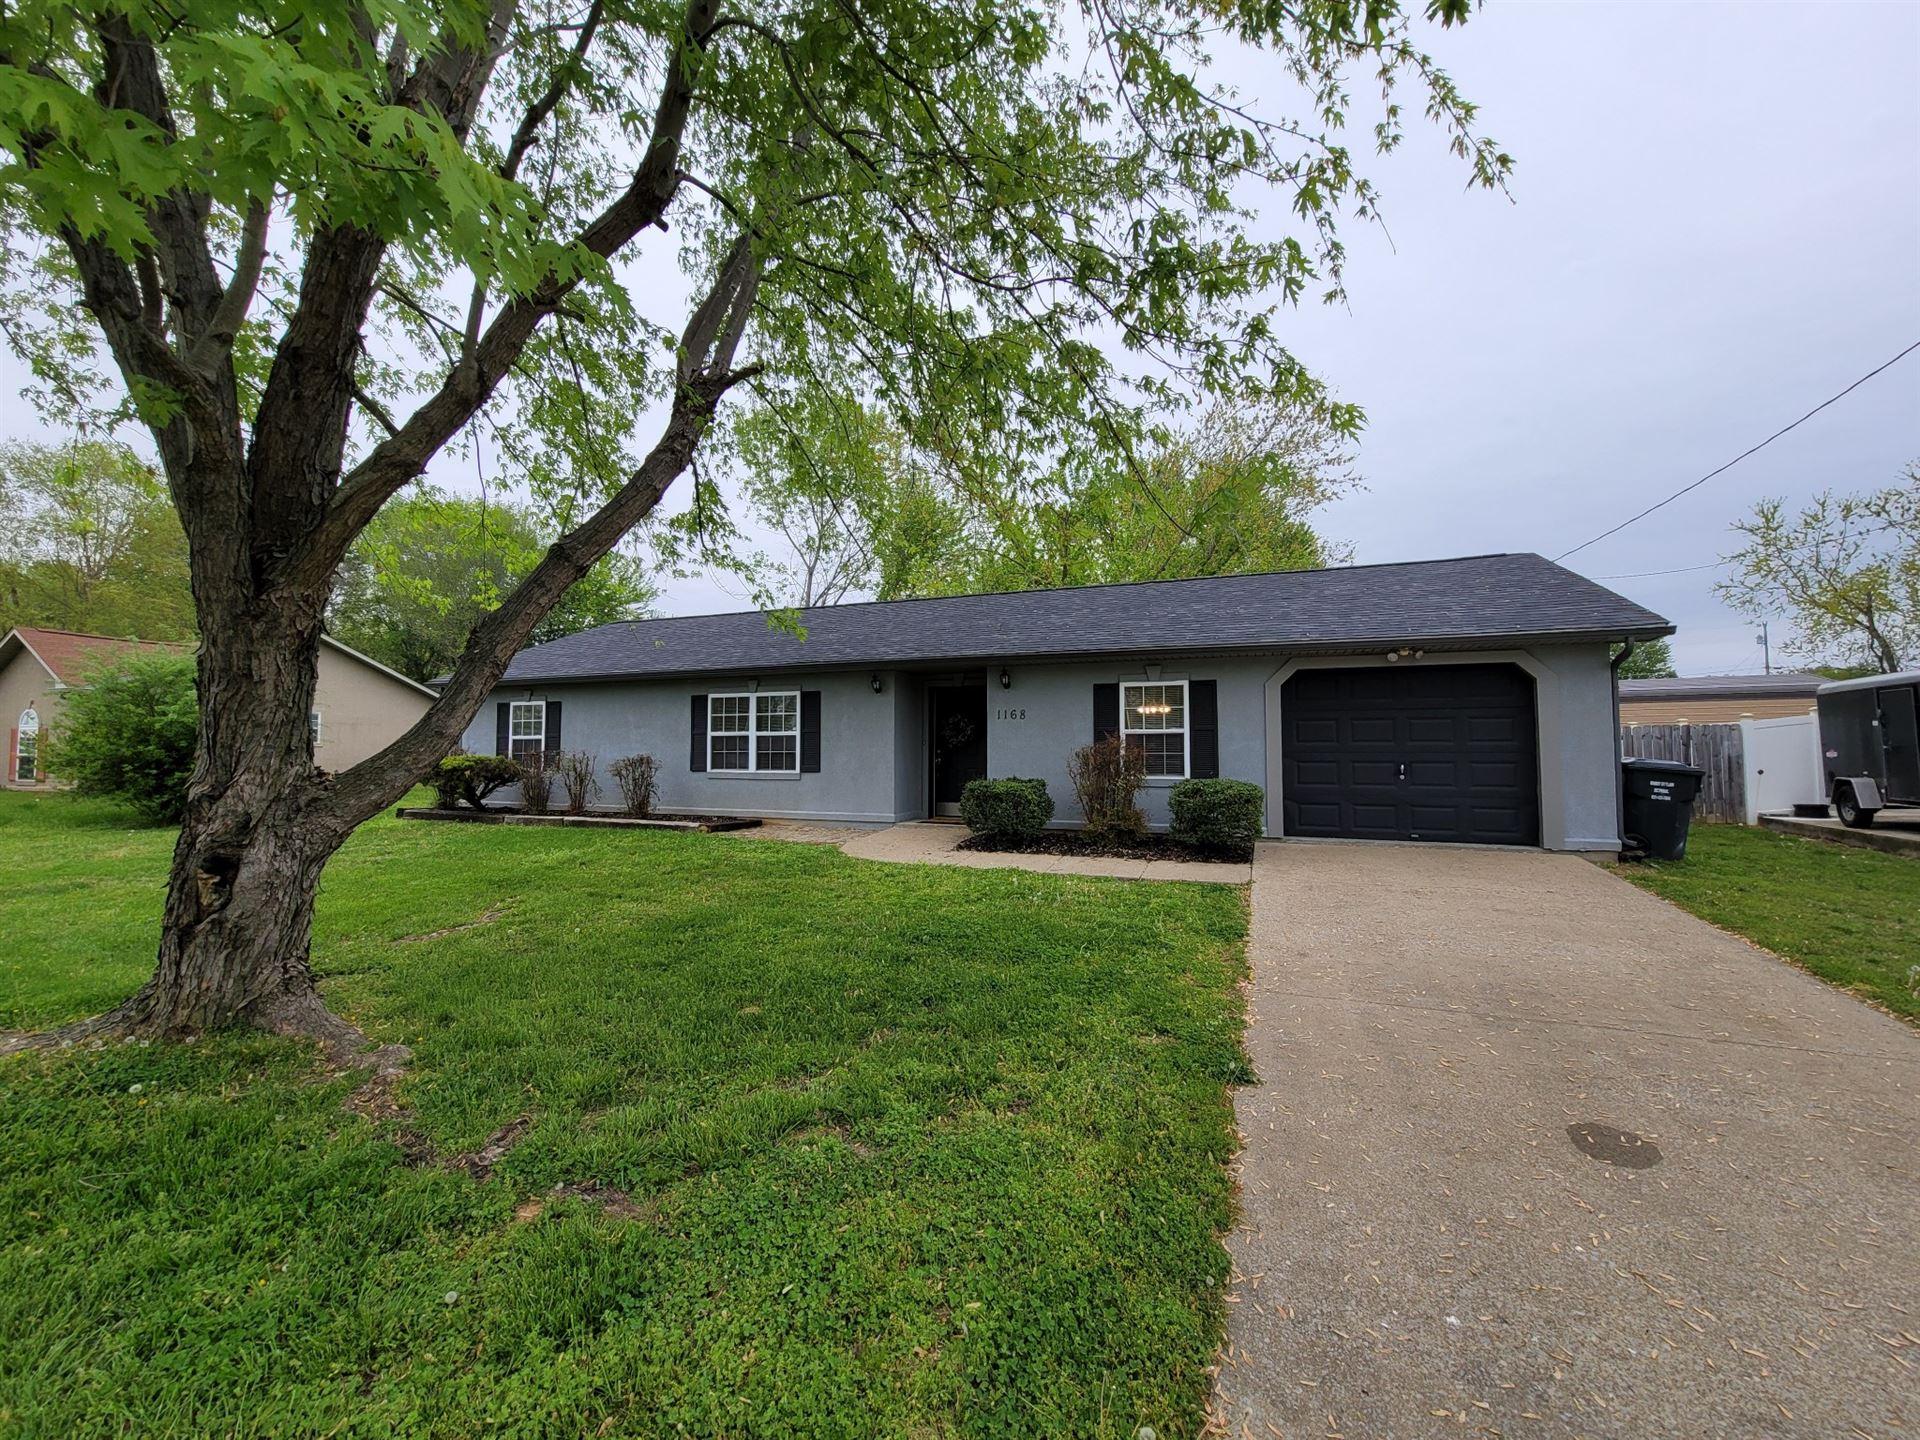 1168 Patton Pl, Oak Grove, KY 42262 - MLS#: 2244676